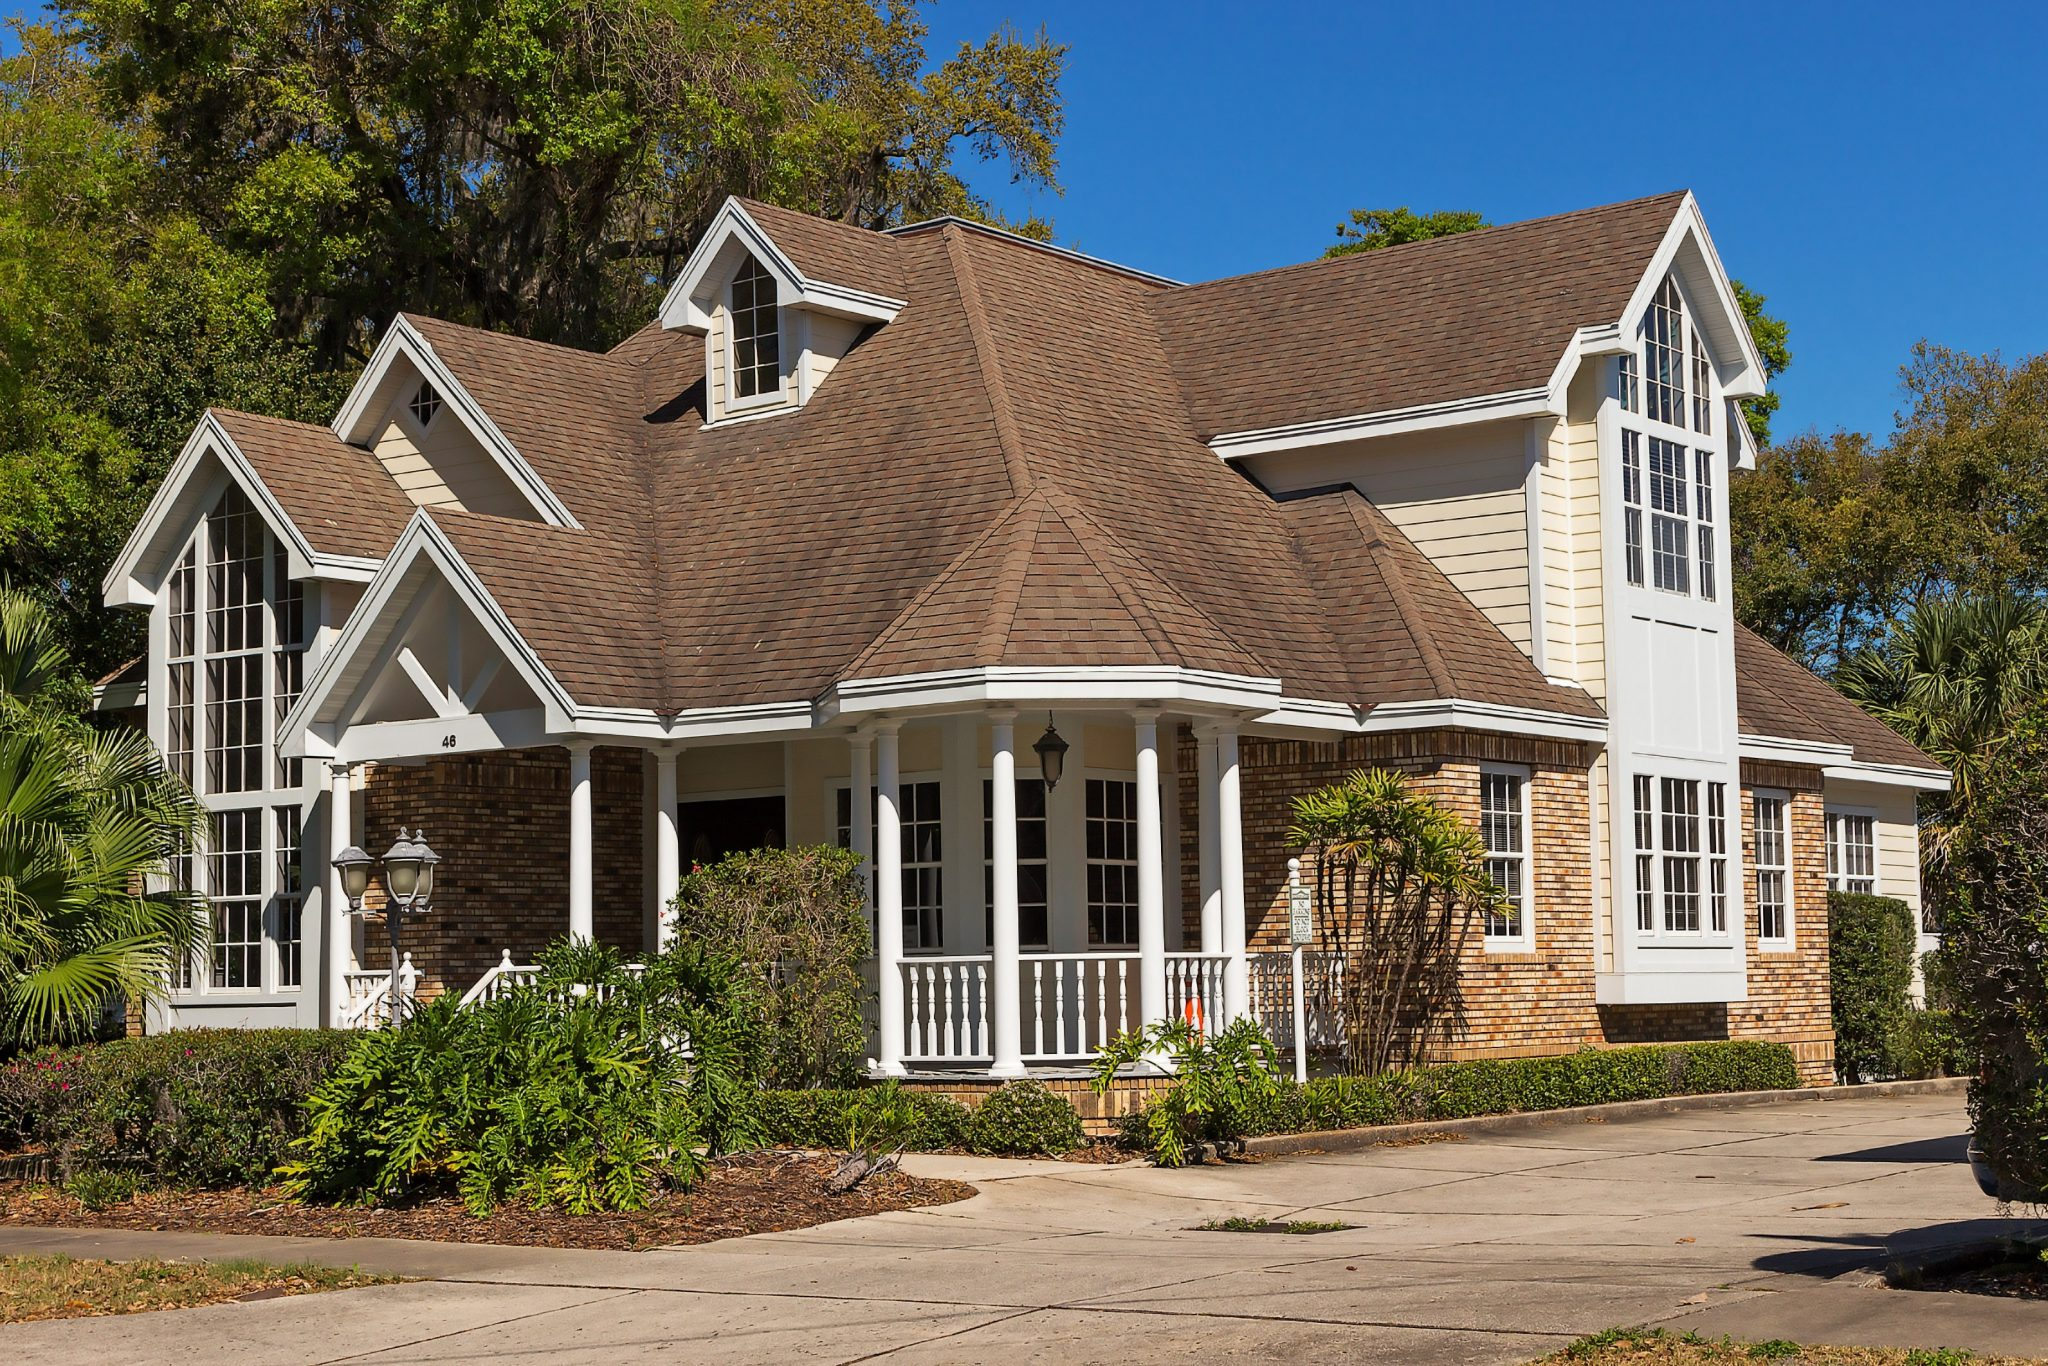 architecture driveway porch 259751